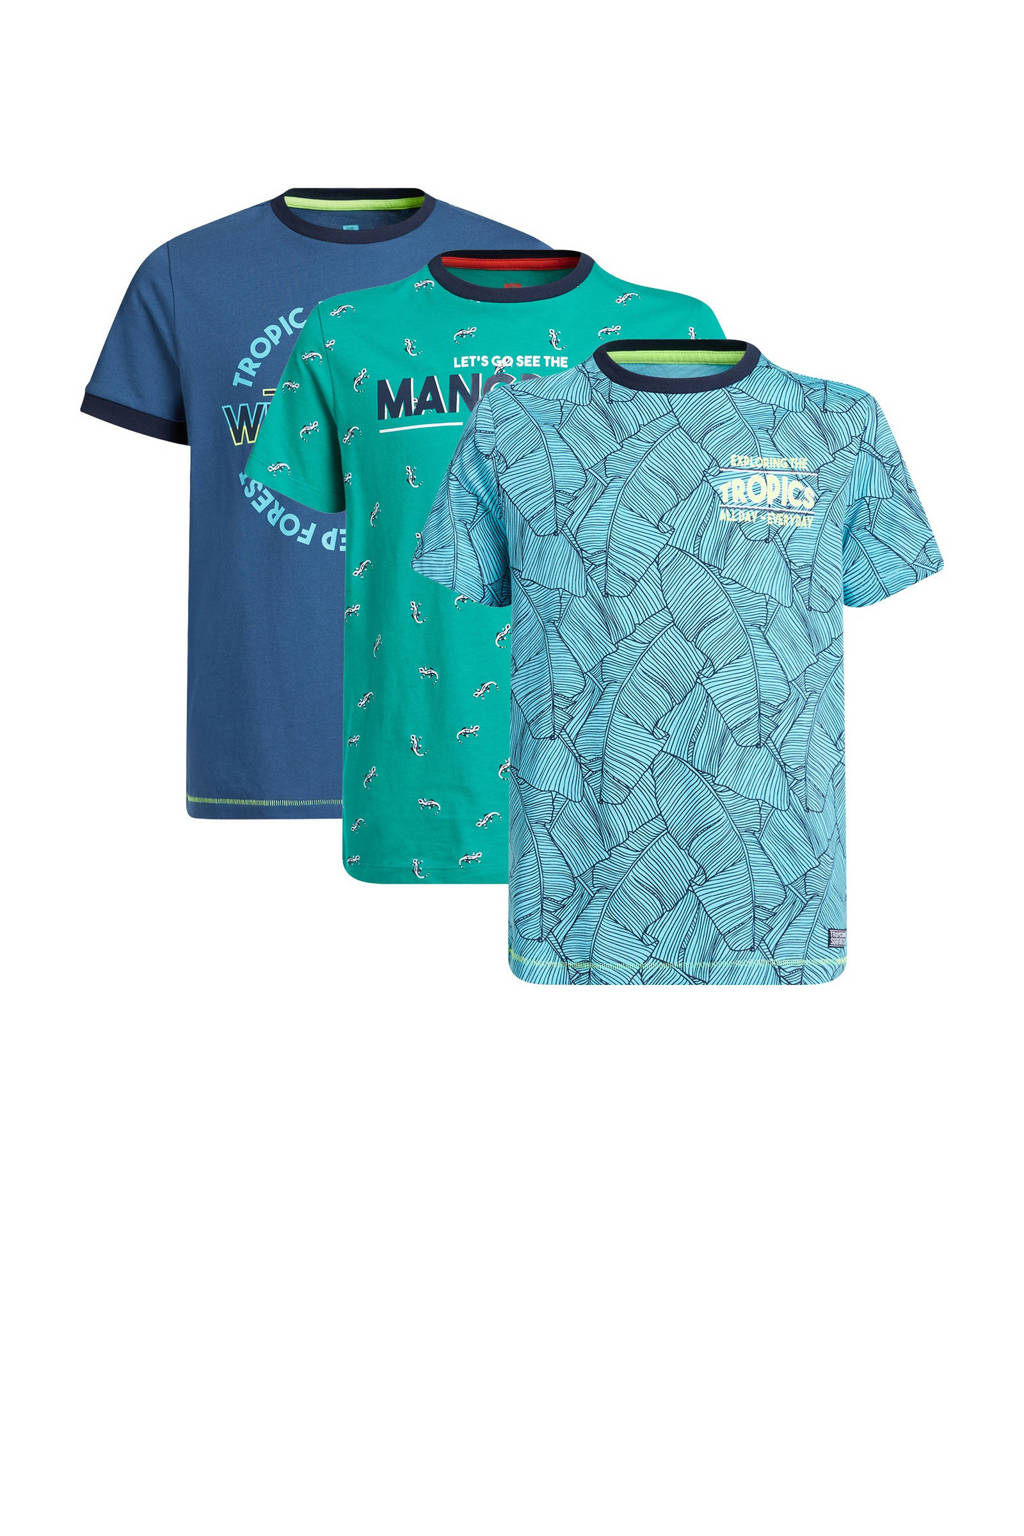 WE Fashion T-shirt - set van 3 blauw/groen/turquoise, Blauw/groen/turquoise